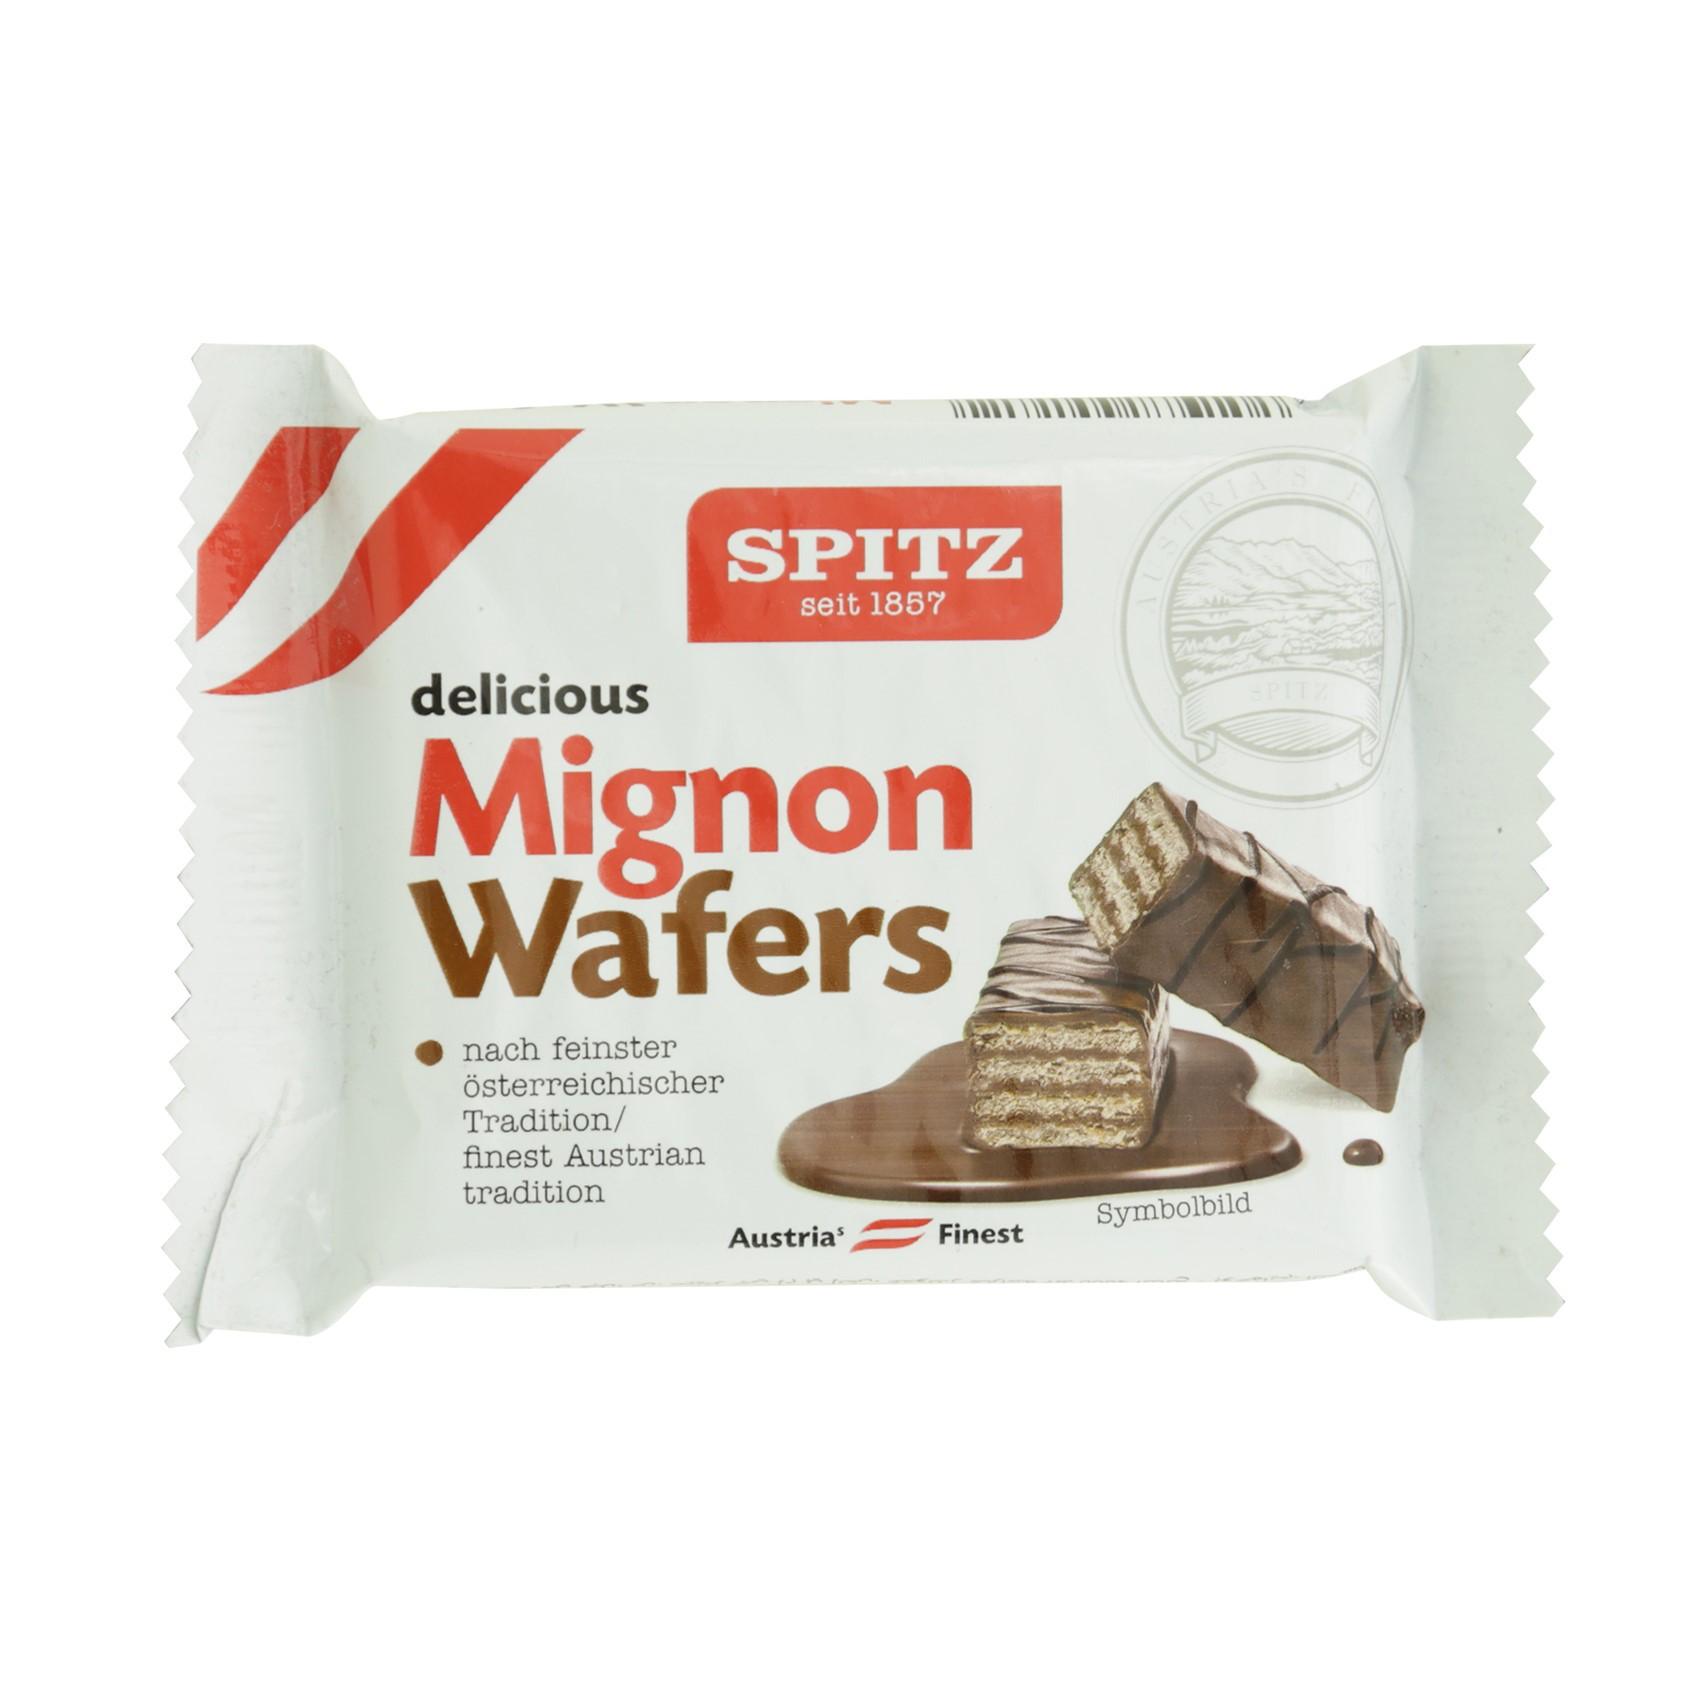 SPITZ MIGNON WAFERS 56G